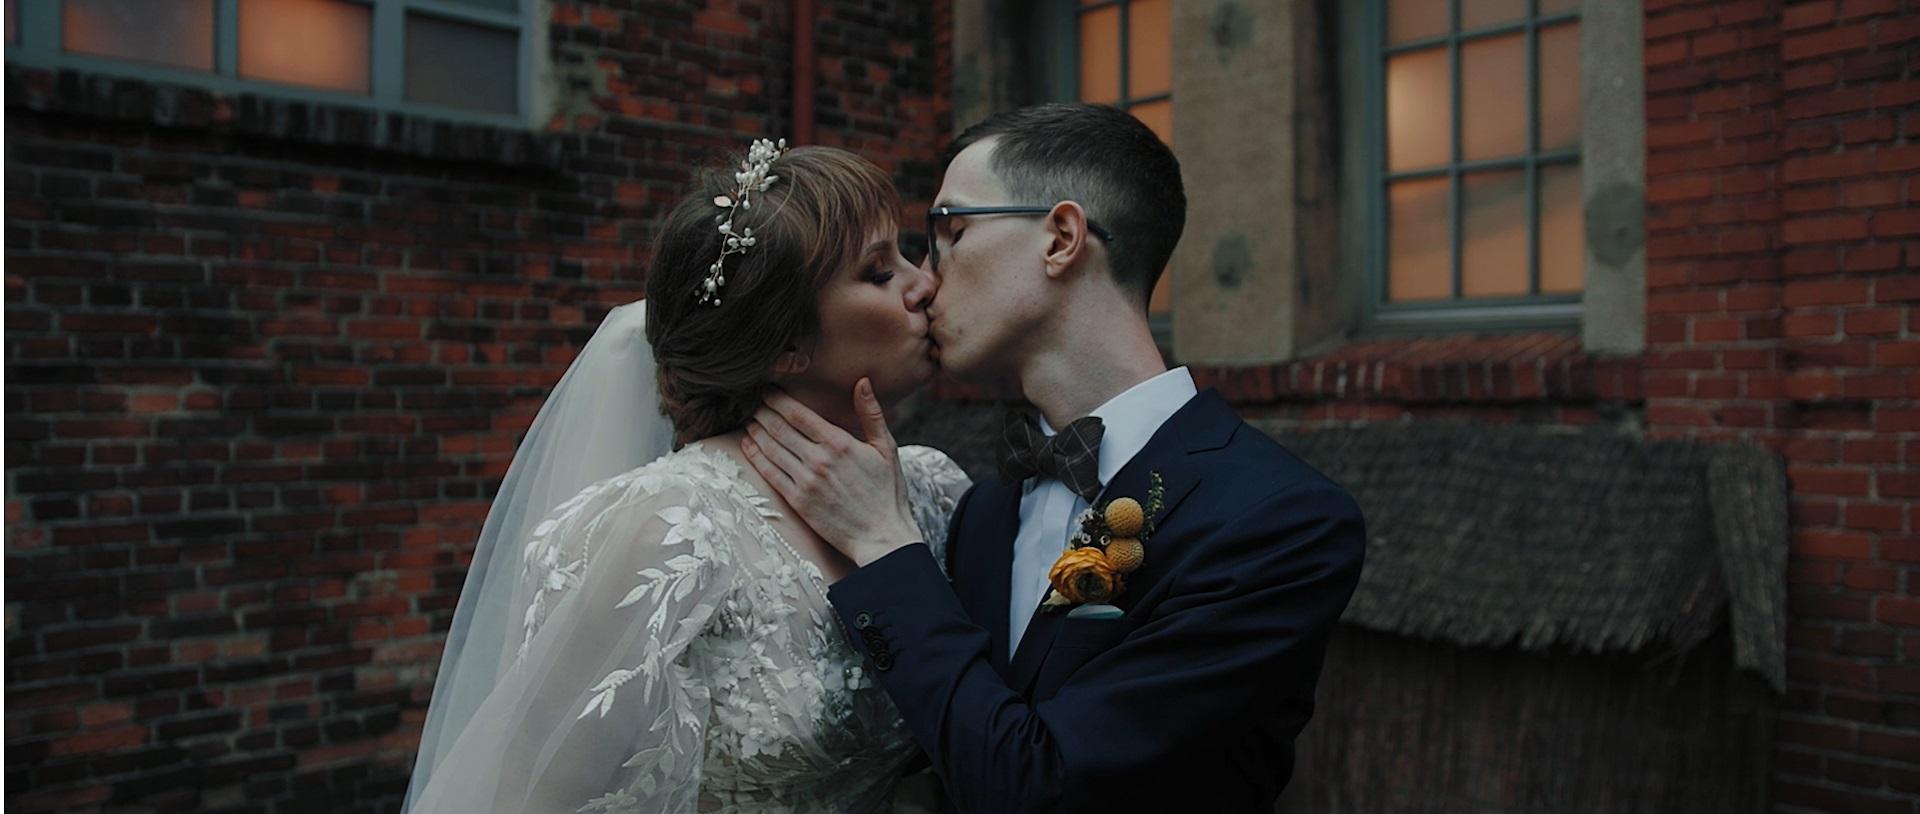 industrial wedding industrialny wesele śląsk